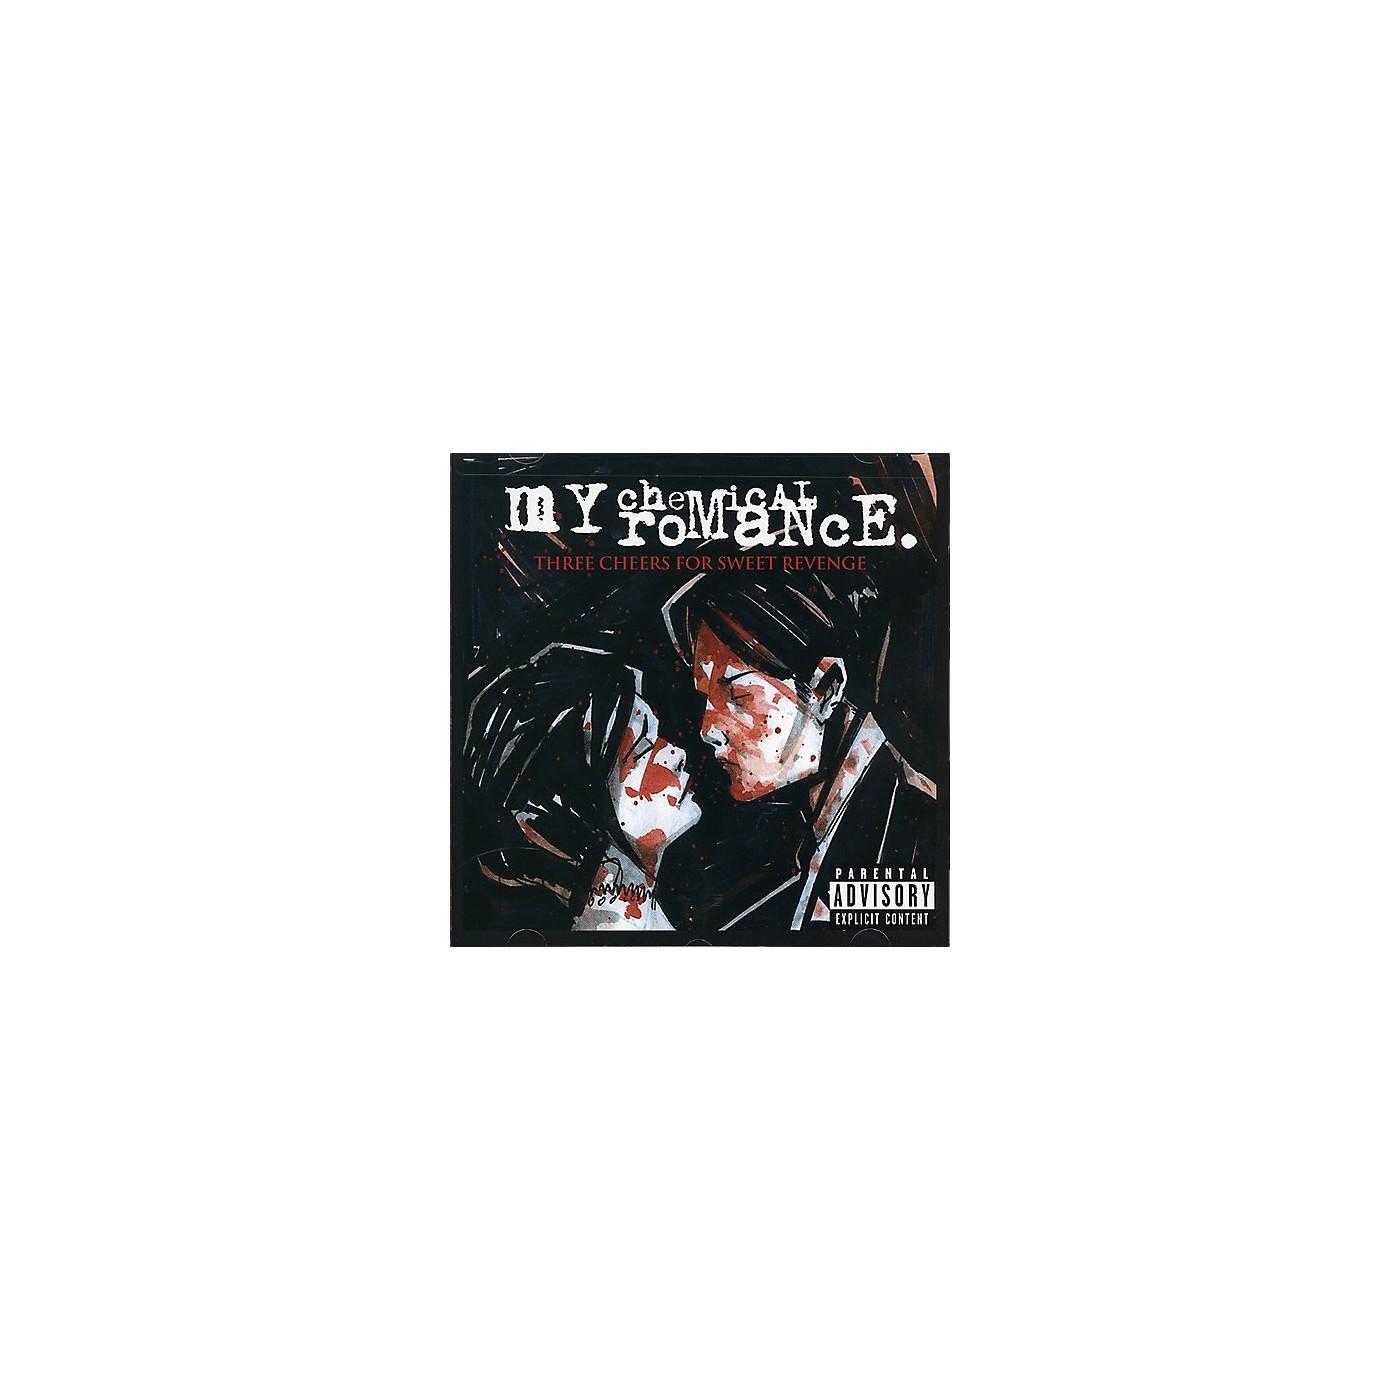 Alliance My Chemical Romance - Three Cheers for Sweet Revenge (CD) thumbnail